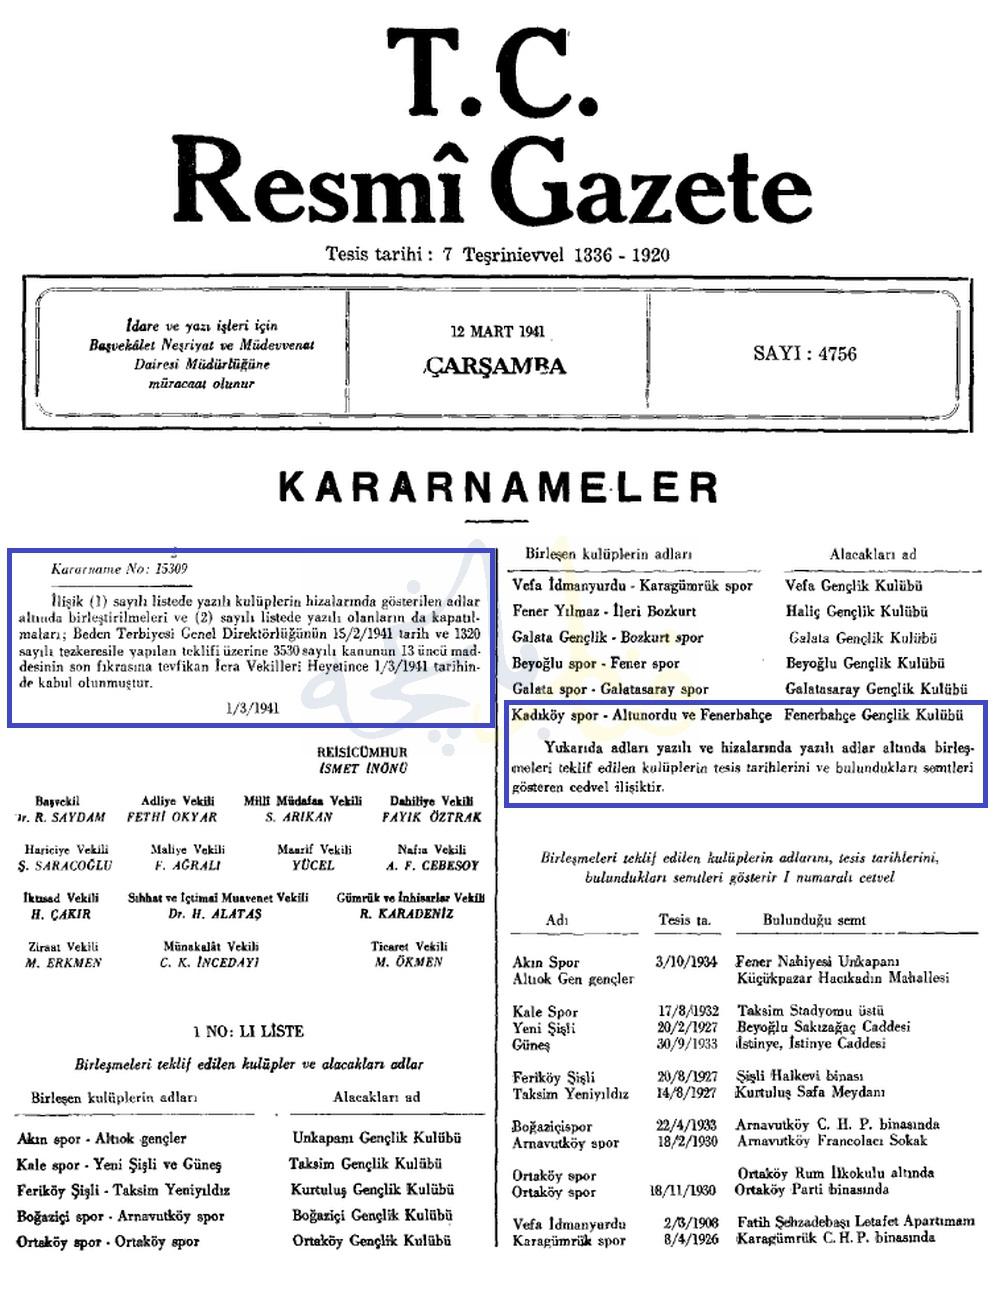 Fenerbahçe Gençlik Kulübü